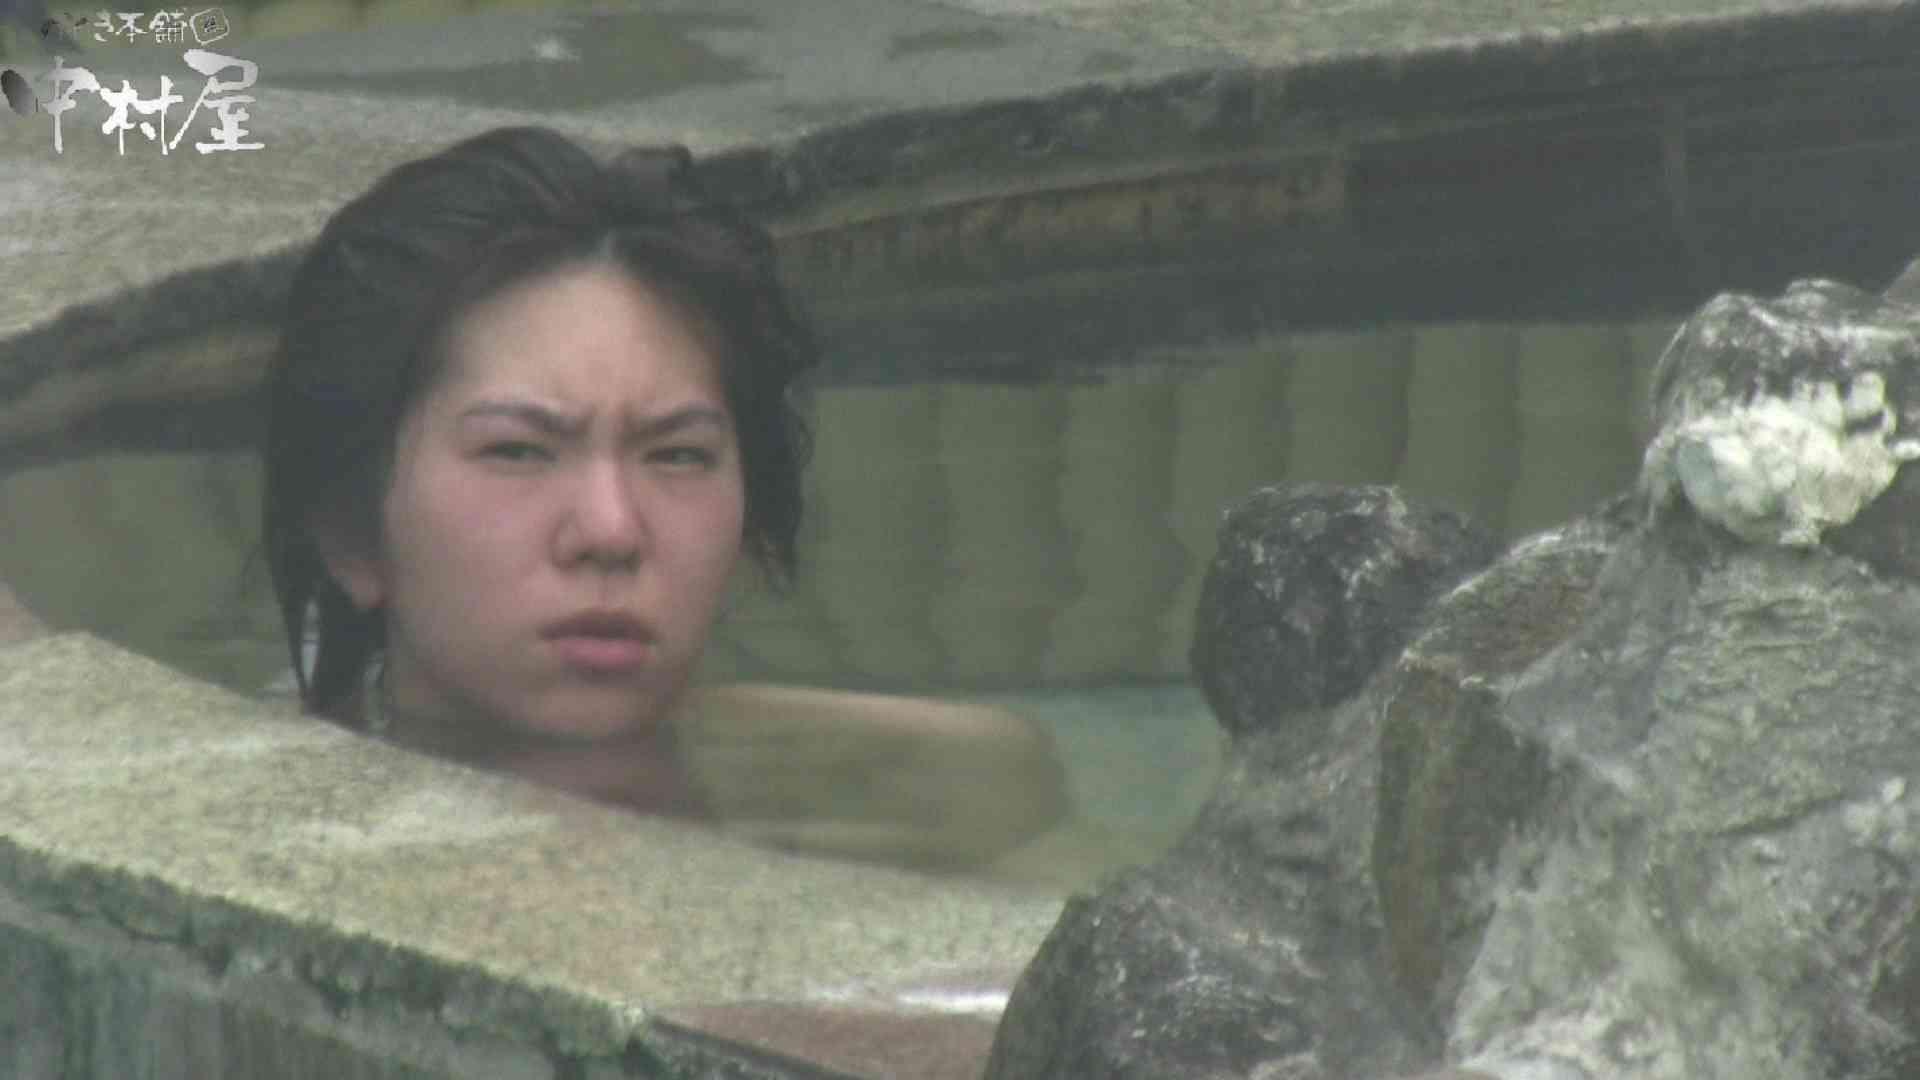 Aquaな露天風呂Vol.907 OL女体  95連発 15